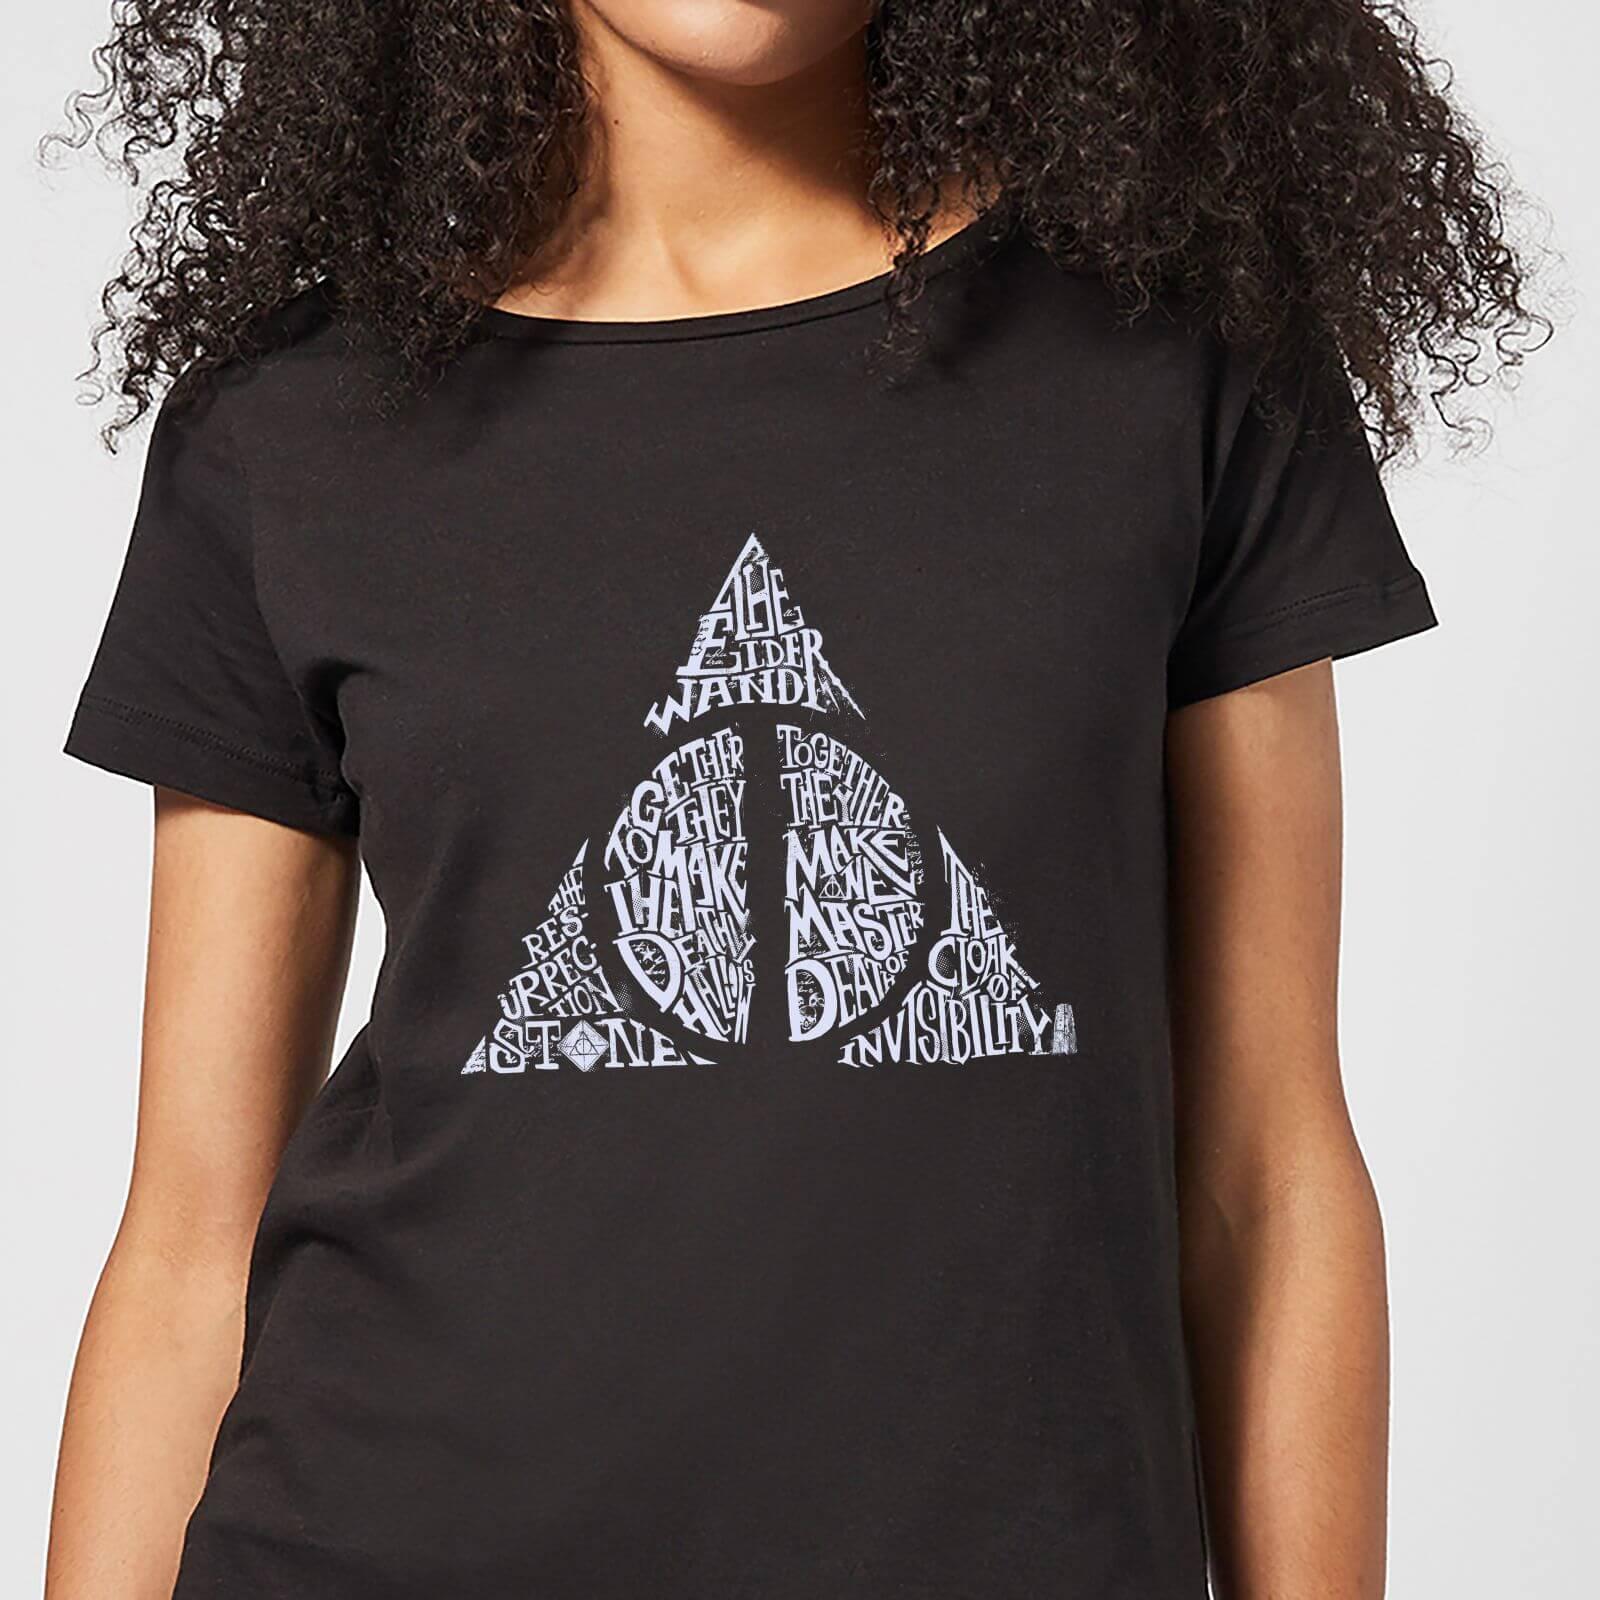 Harry Potter Deathly Hallows Text Women's T-Shirt - Black - S - Noir